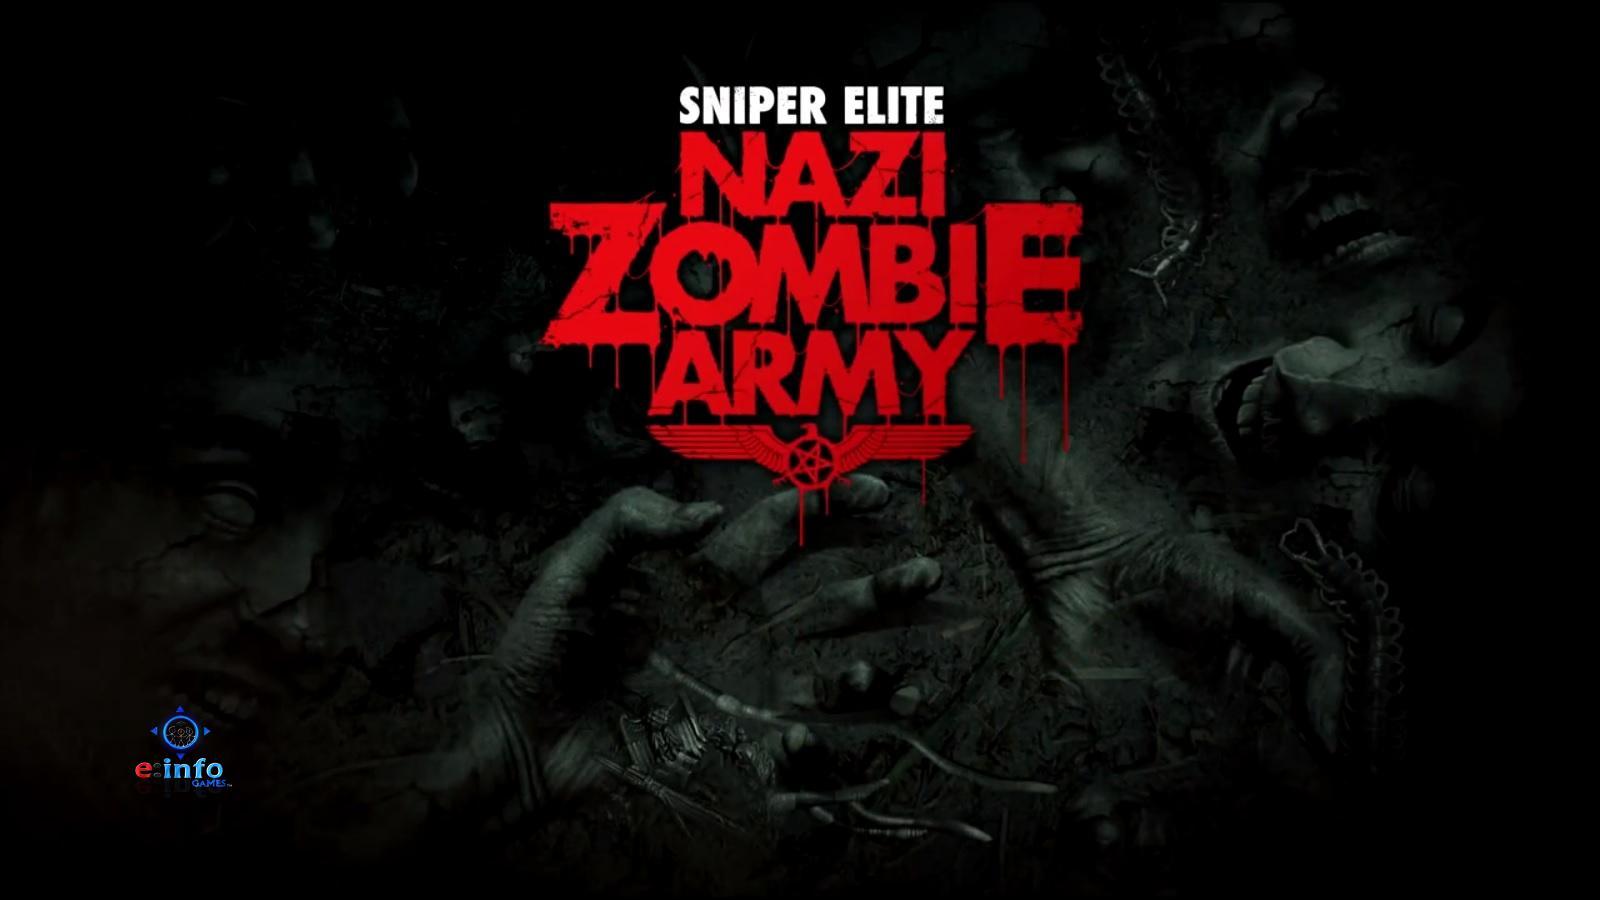 1373986370-1372688660-1363896325-1363823513-Sniper-Elite-Nazi-Zombie-Army